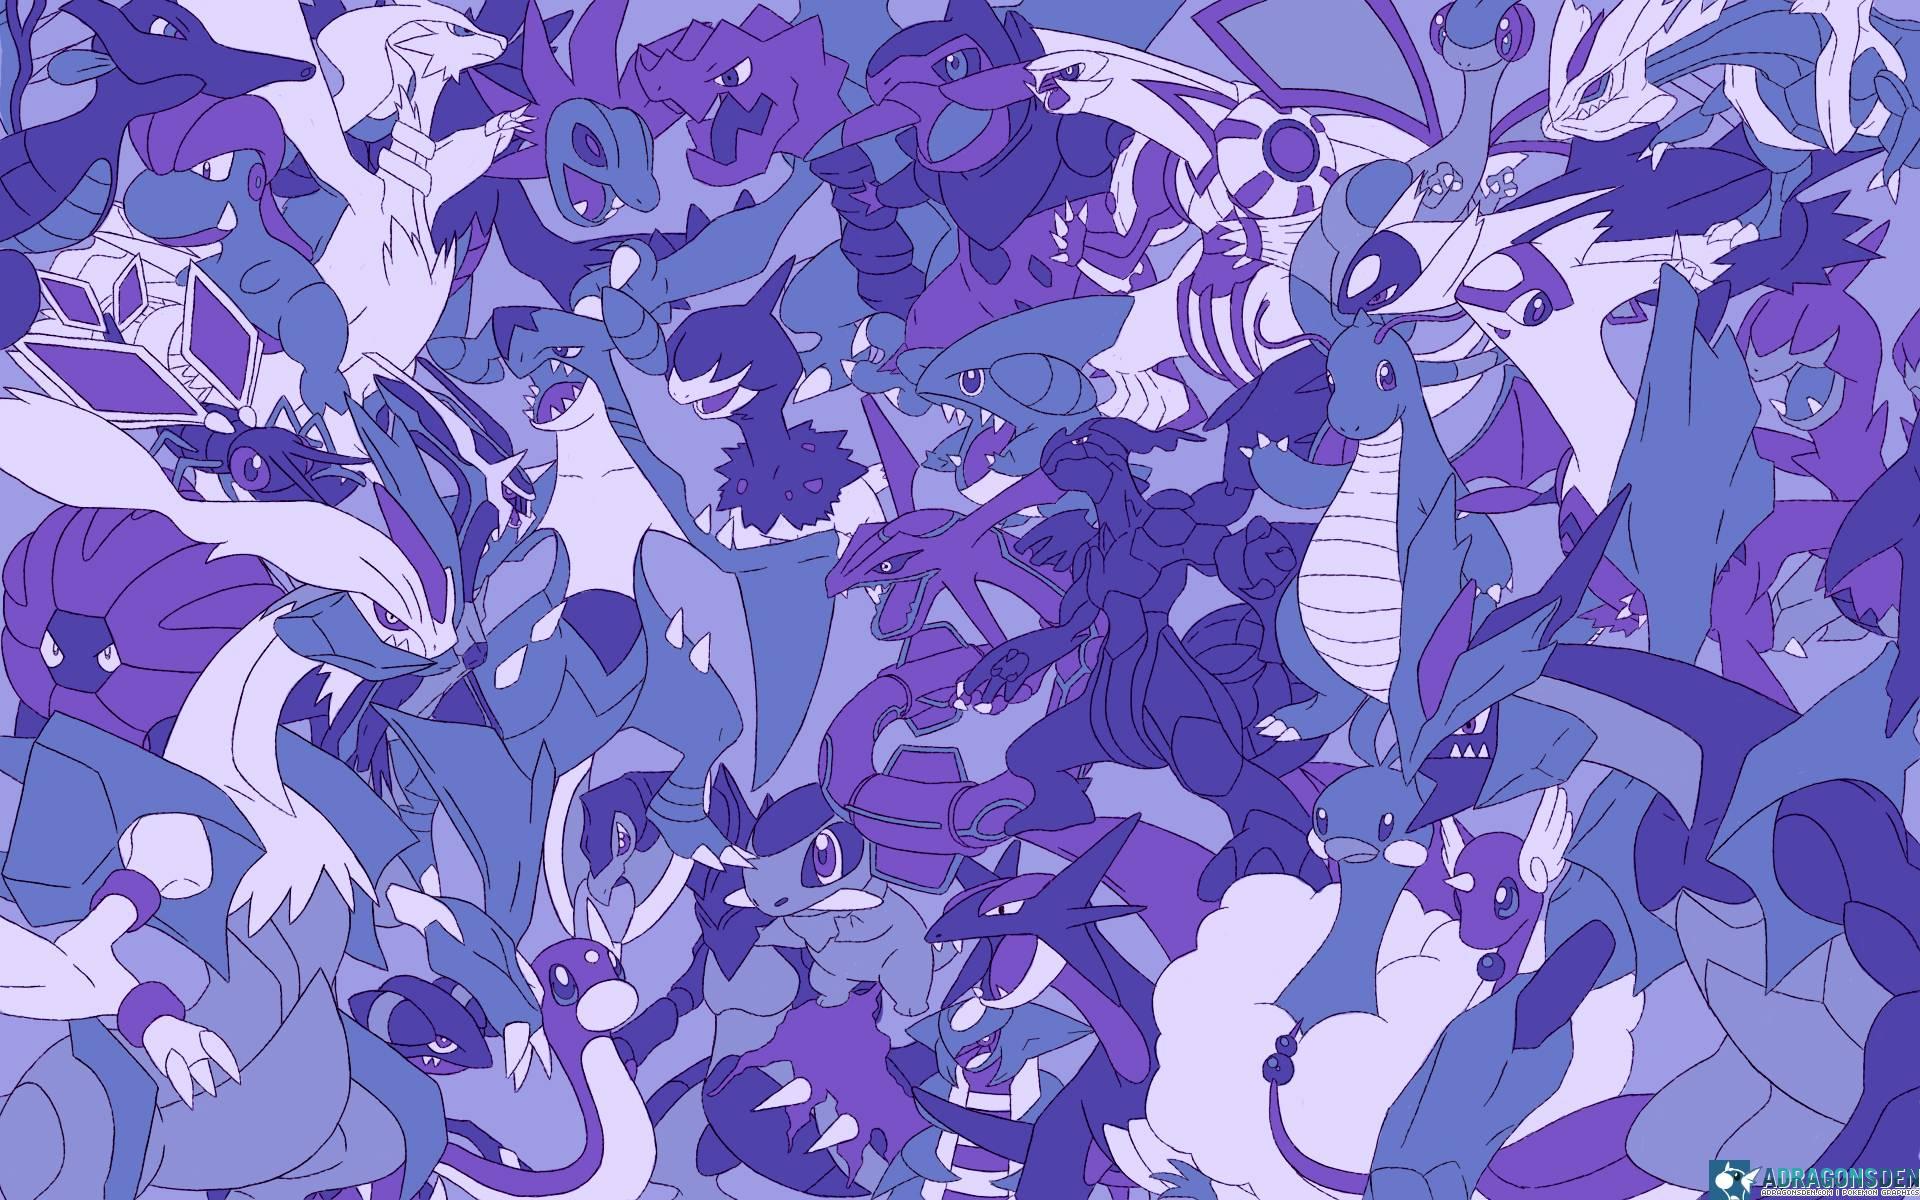 ice type pokemon wallpaper - photo #28